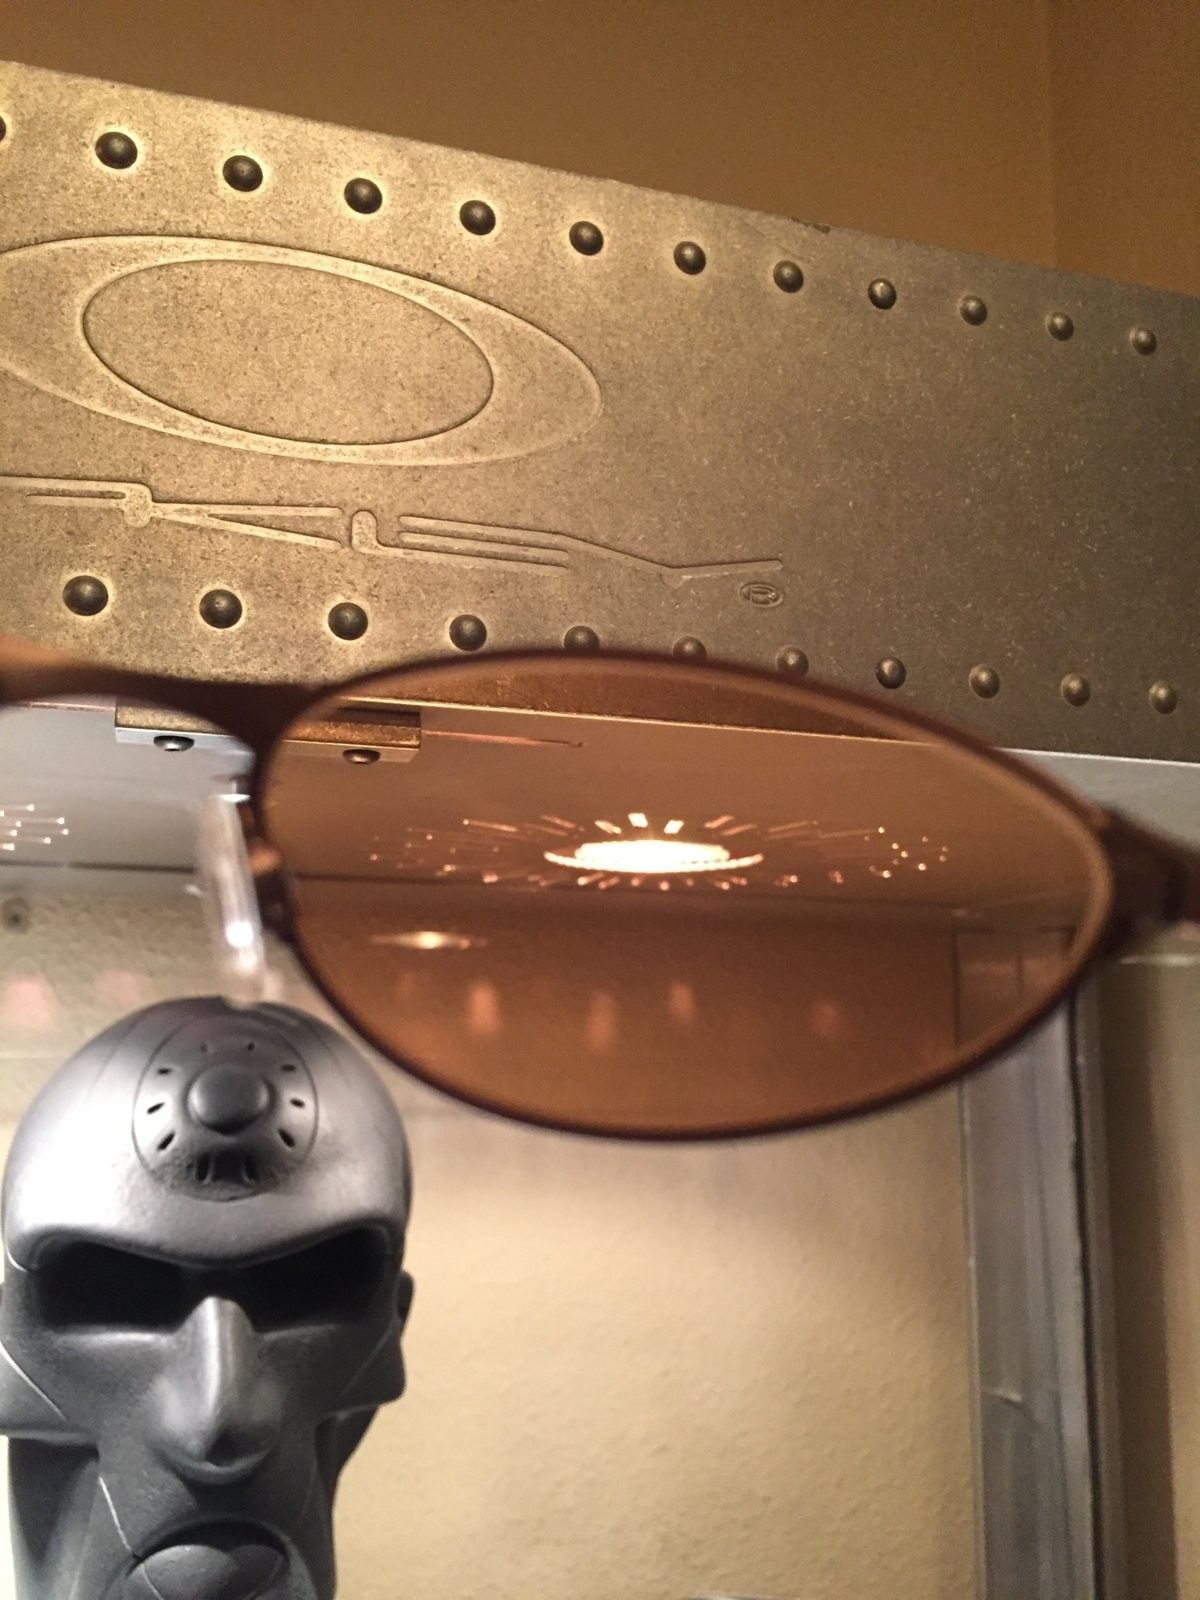 WTS LNOB Teaspoon Light Bronze w/ black persimmon iridium SKU: 05-781 - image.jpeg